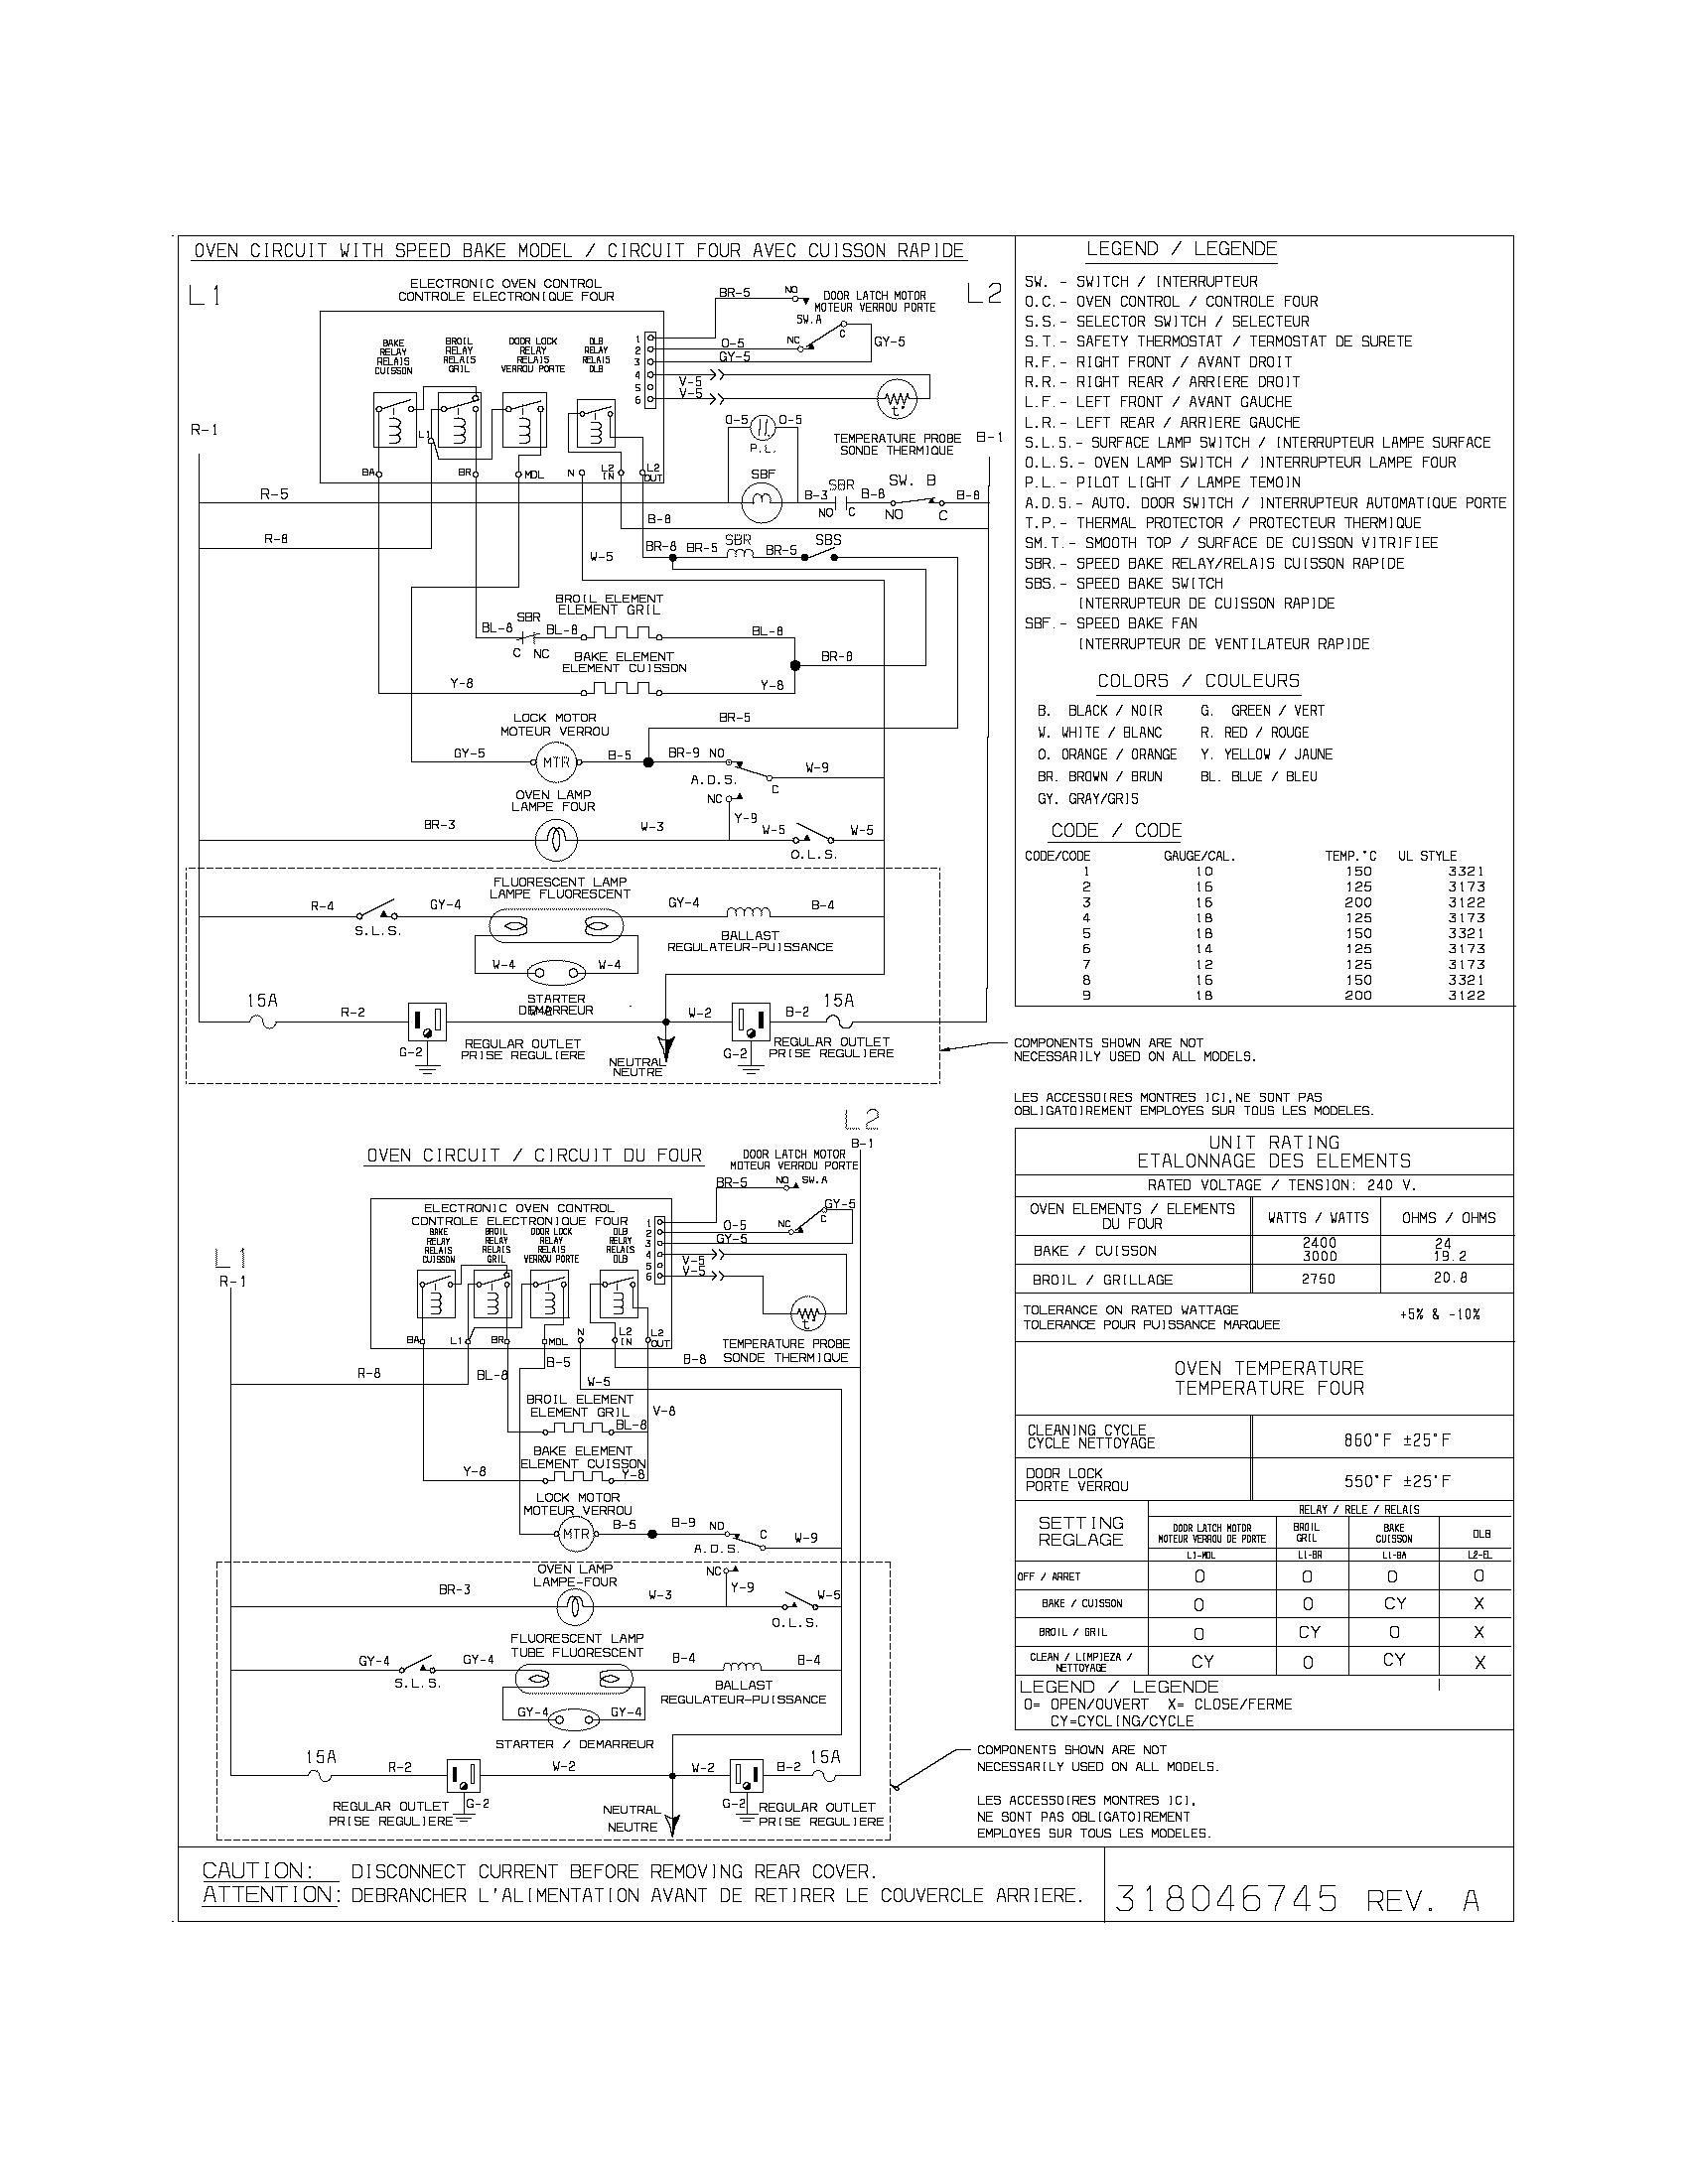 800 Wiring Diagram For Robert – K1200rs Wiring Diagram